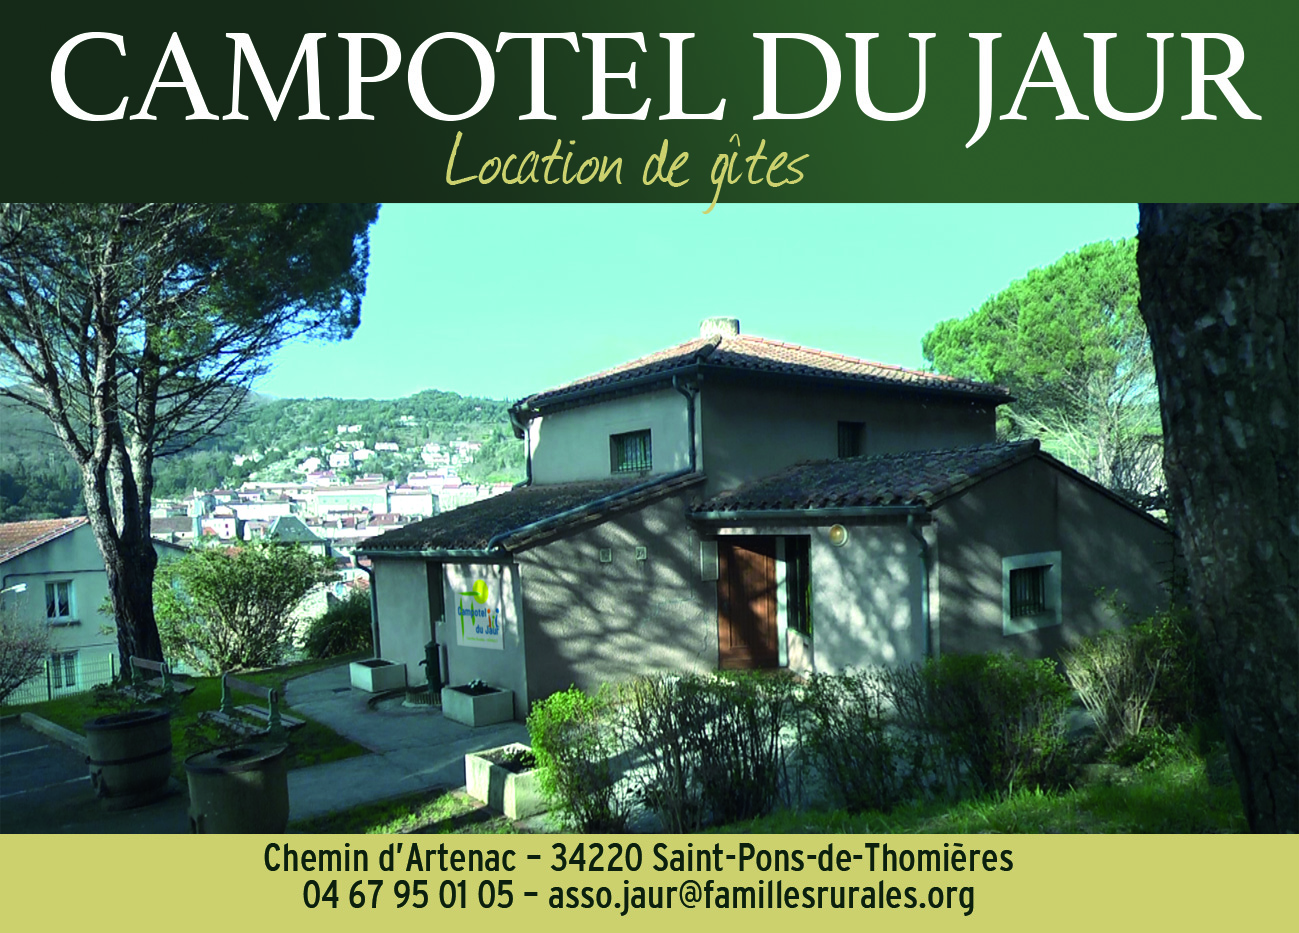 Campotel du Jaur